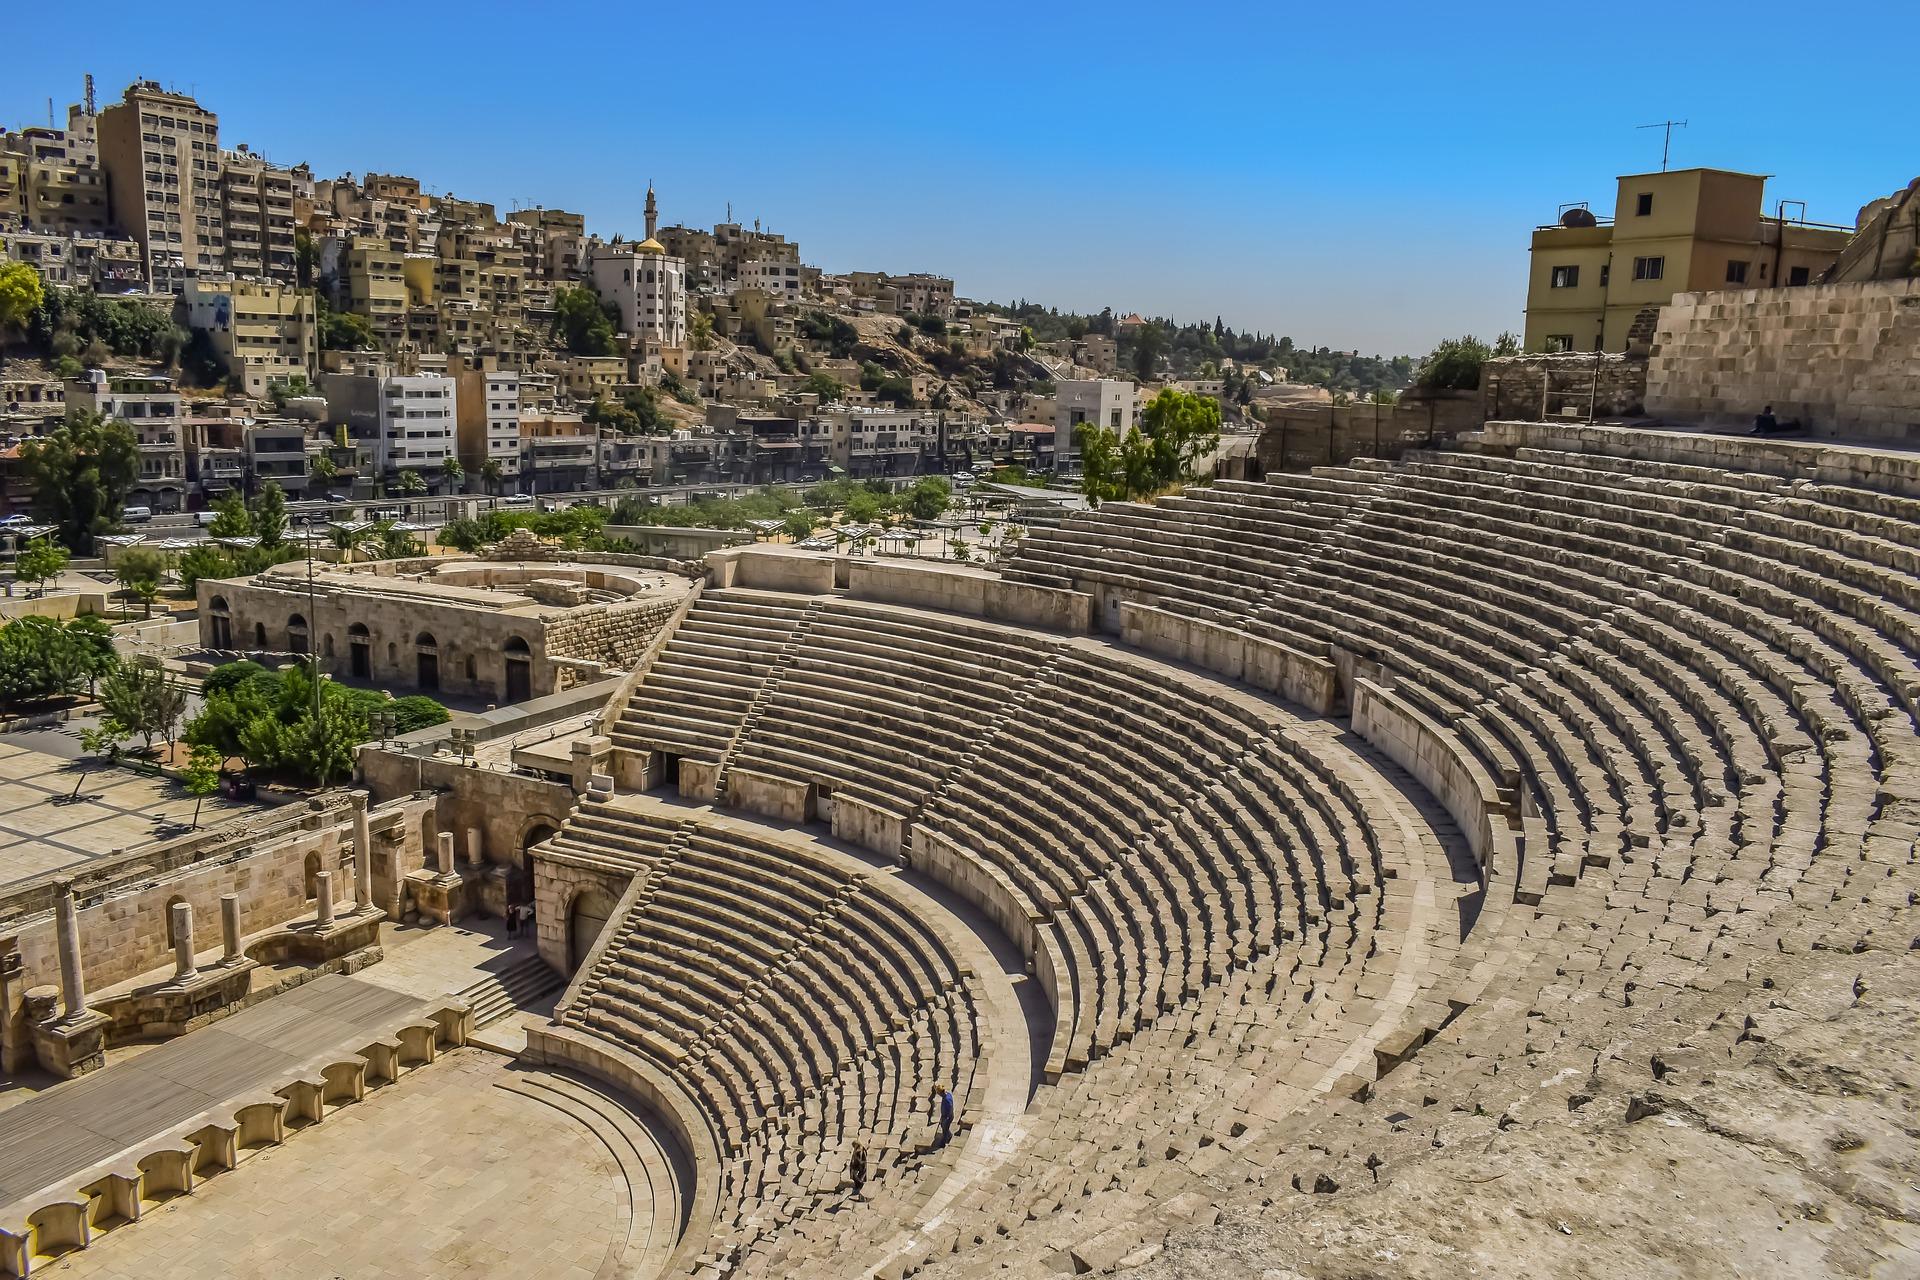 Amphitheatre_Amman.jpg?1565358721